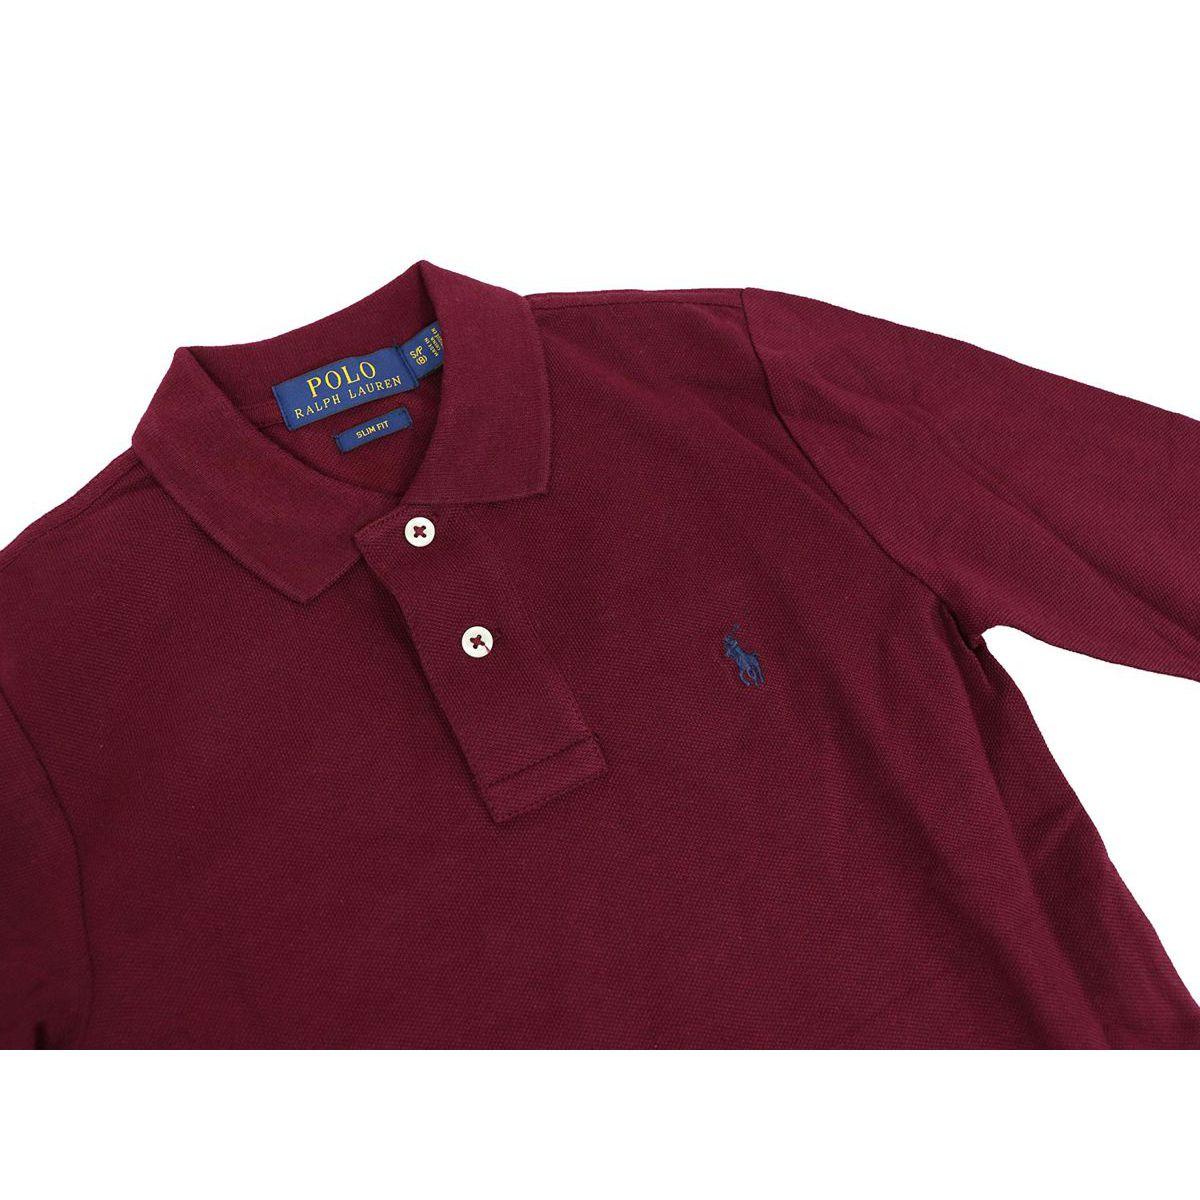 Two-button cotton polo shirt with contrast logo embroidery Bordeaux Polo Ralph Lauren